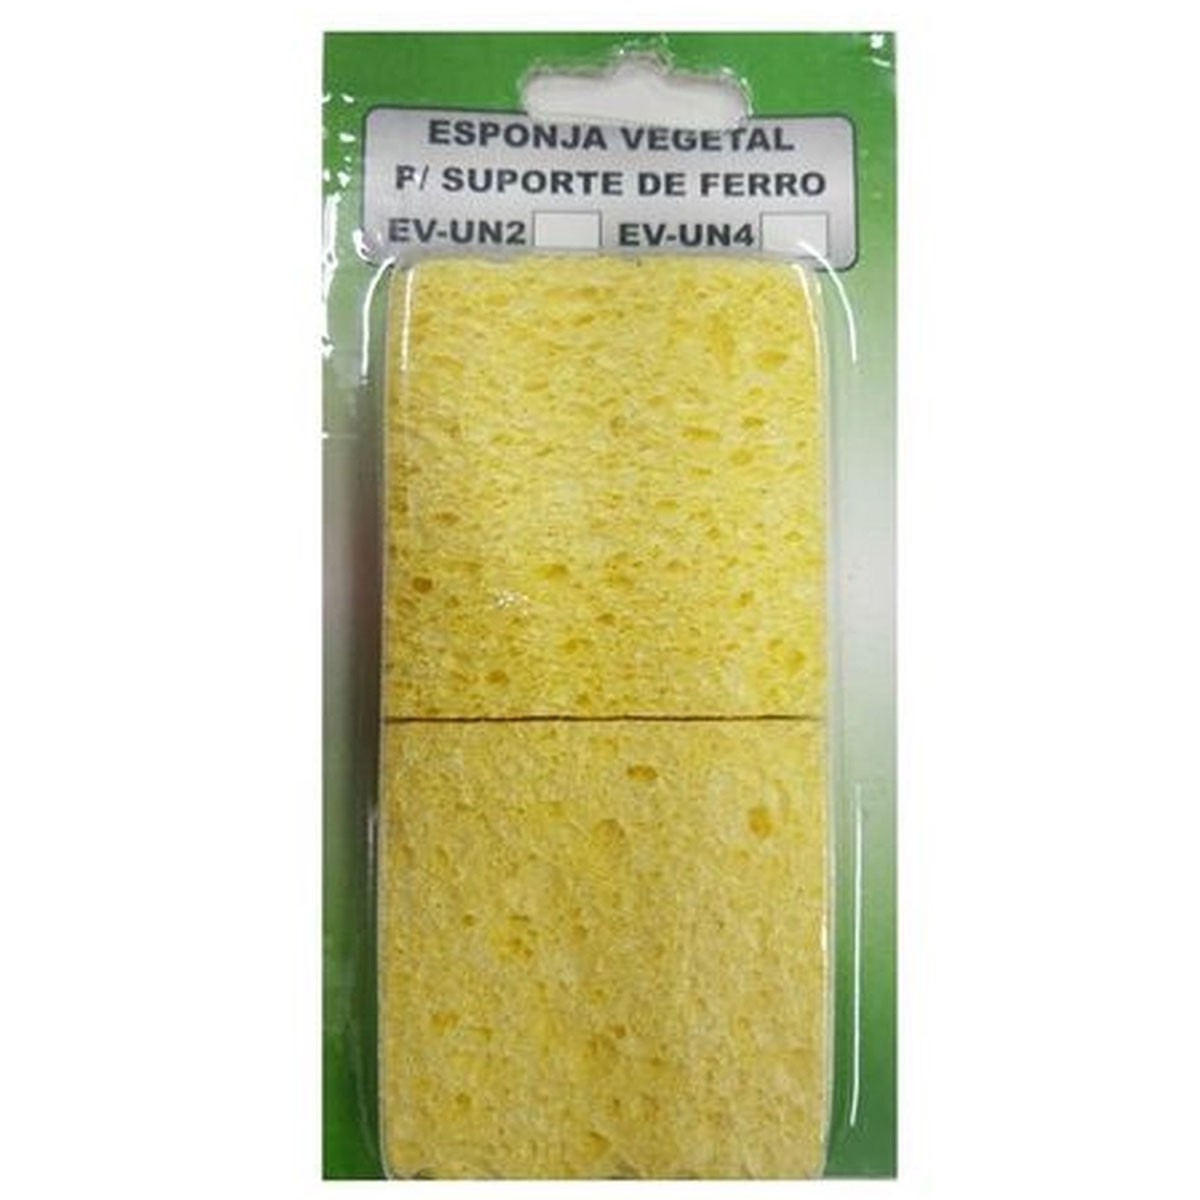 Blister com 4 Unidades de Esponja Vegetal EV-UN4 - Suetoku